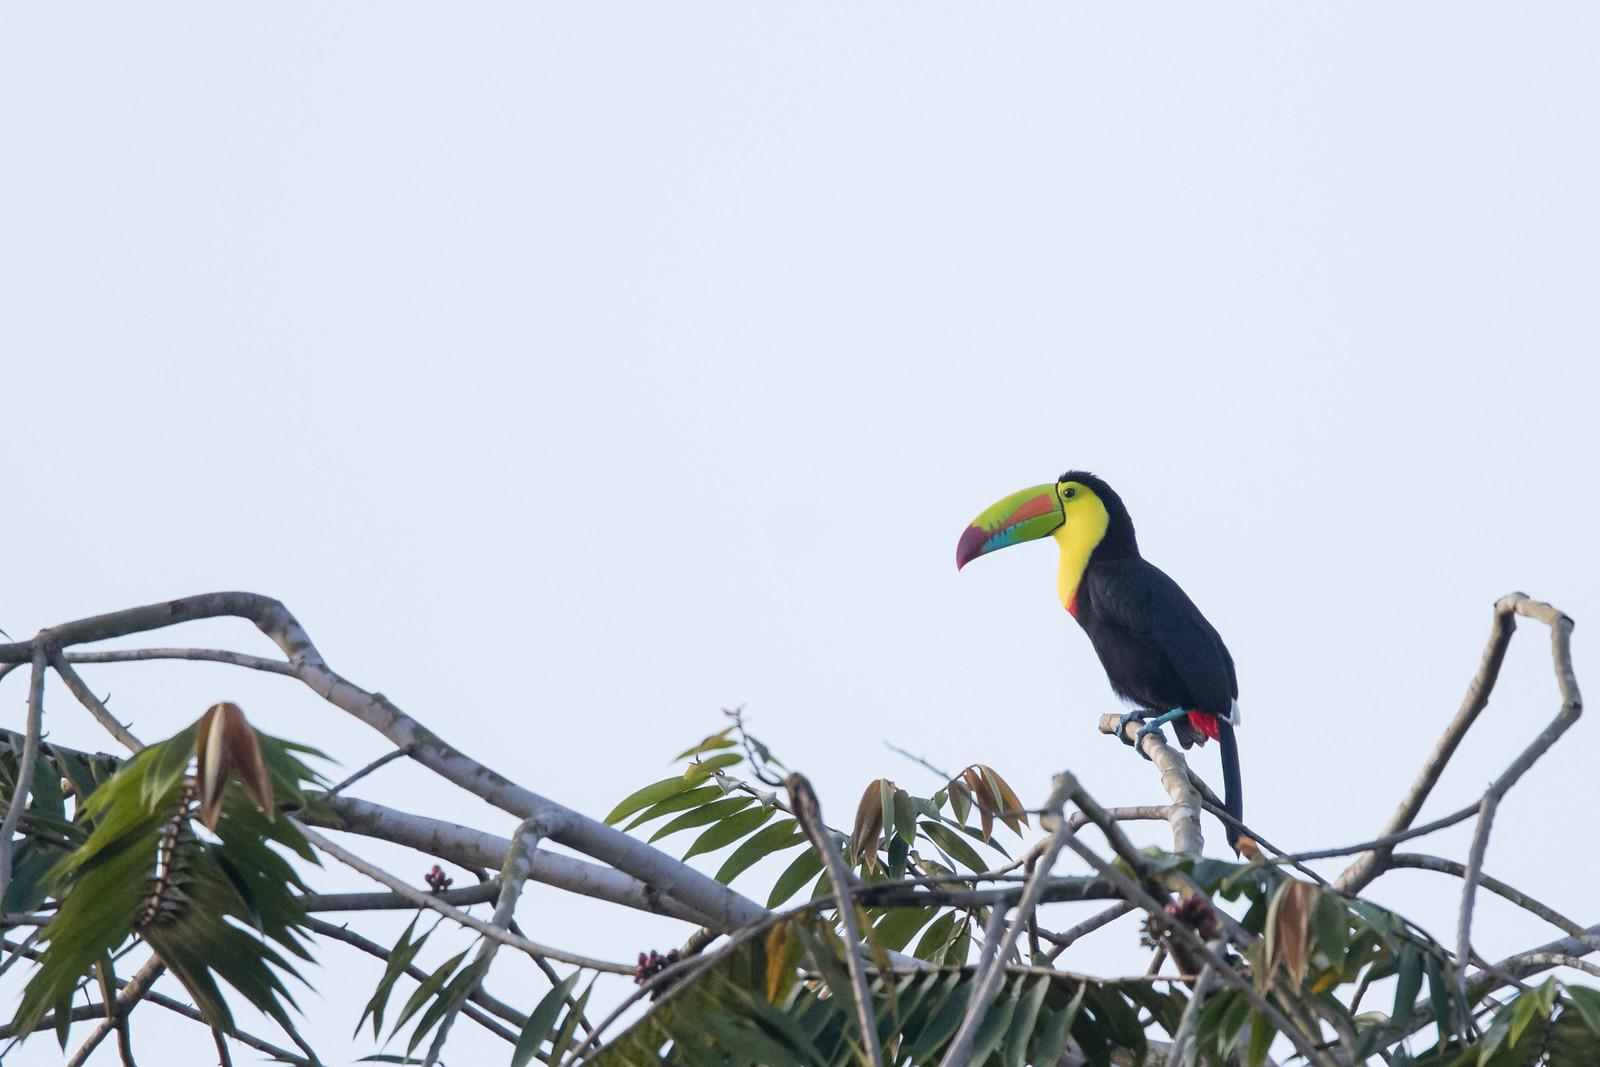 Keel-billed Toucan - Summit Ponds, Colon, Panama